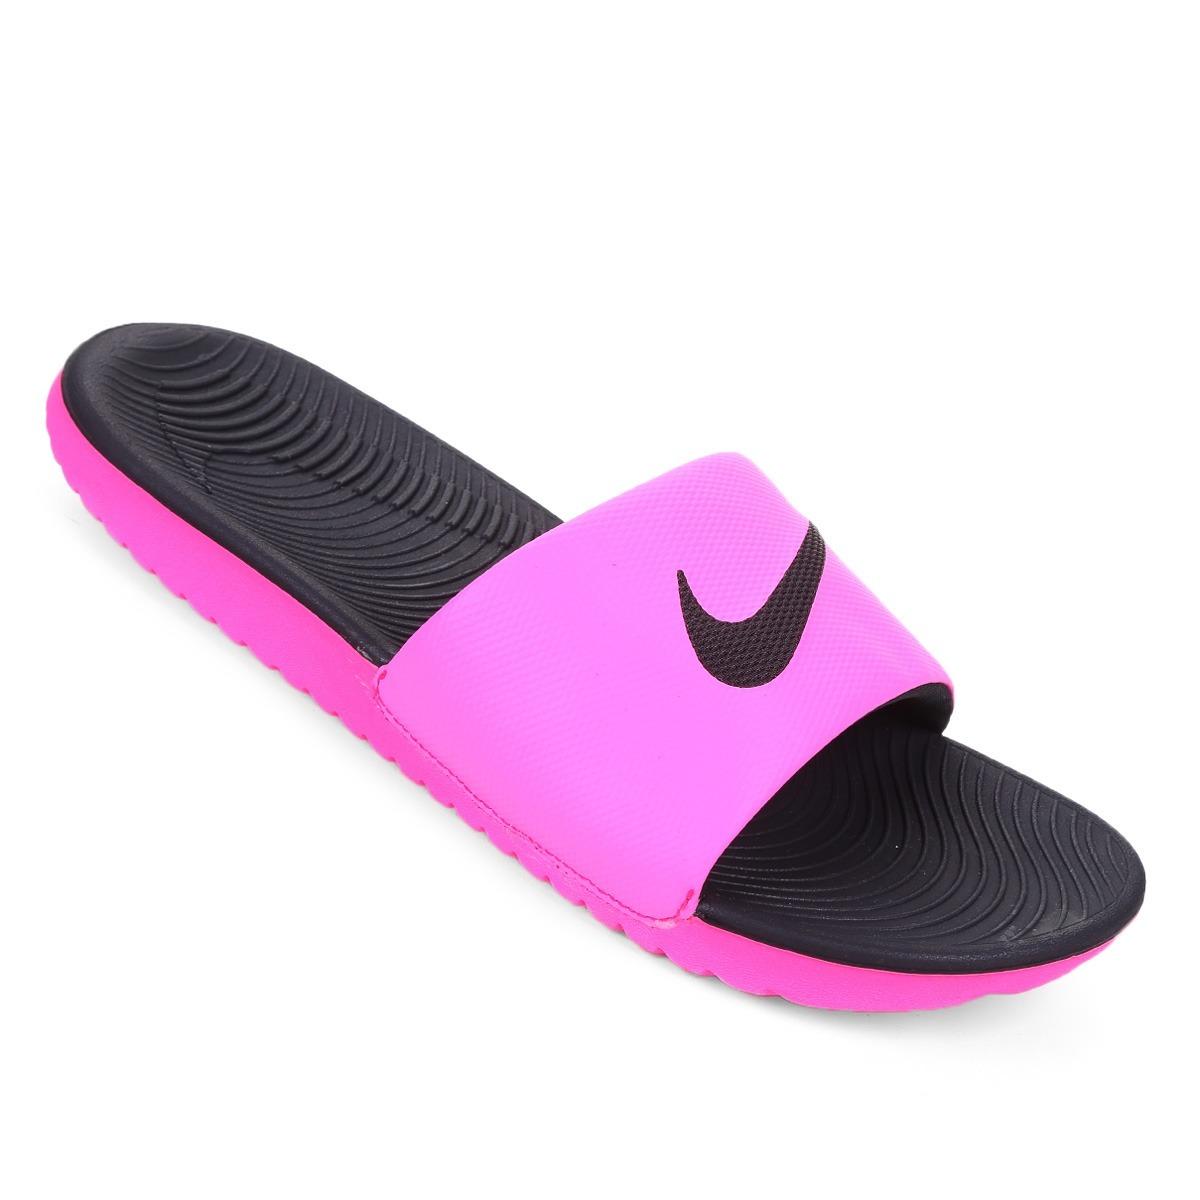 87b40f172 Chinelo Nike Kawa Slide Feminina Juvenil (novo E Original) - R  50 ...